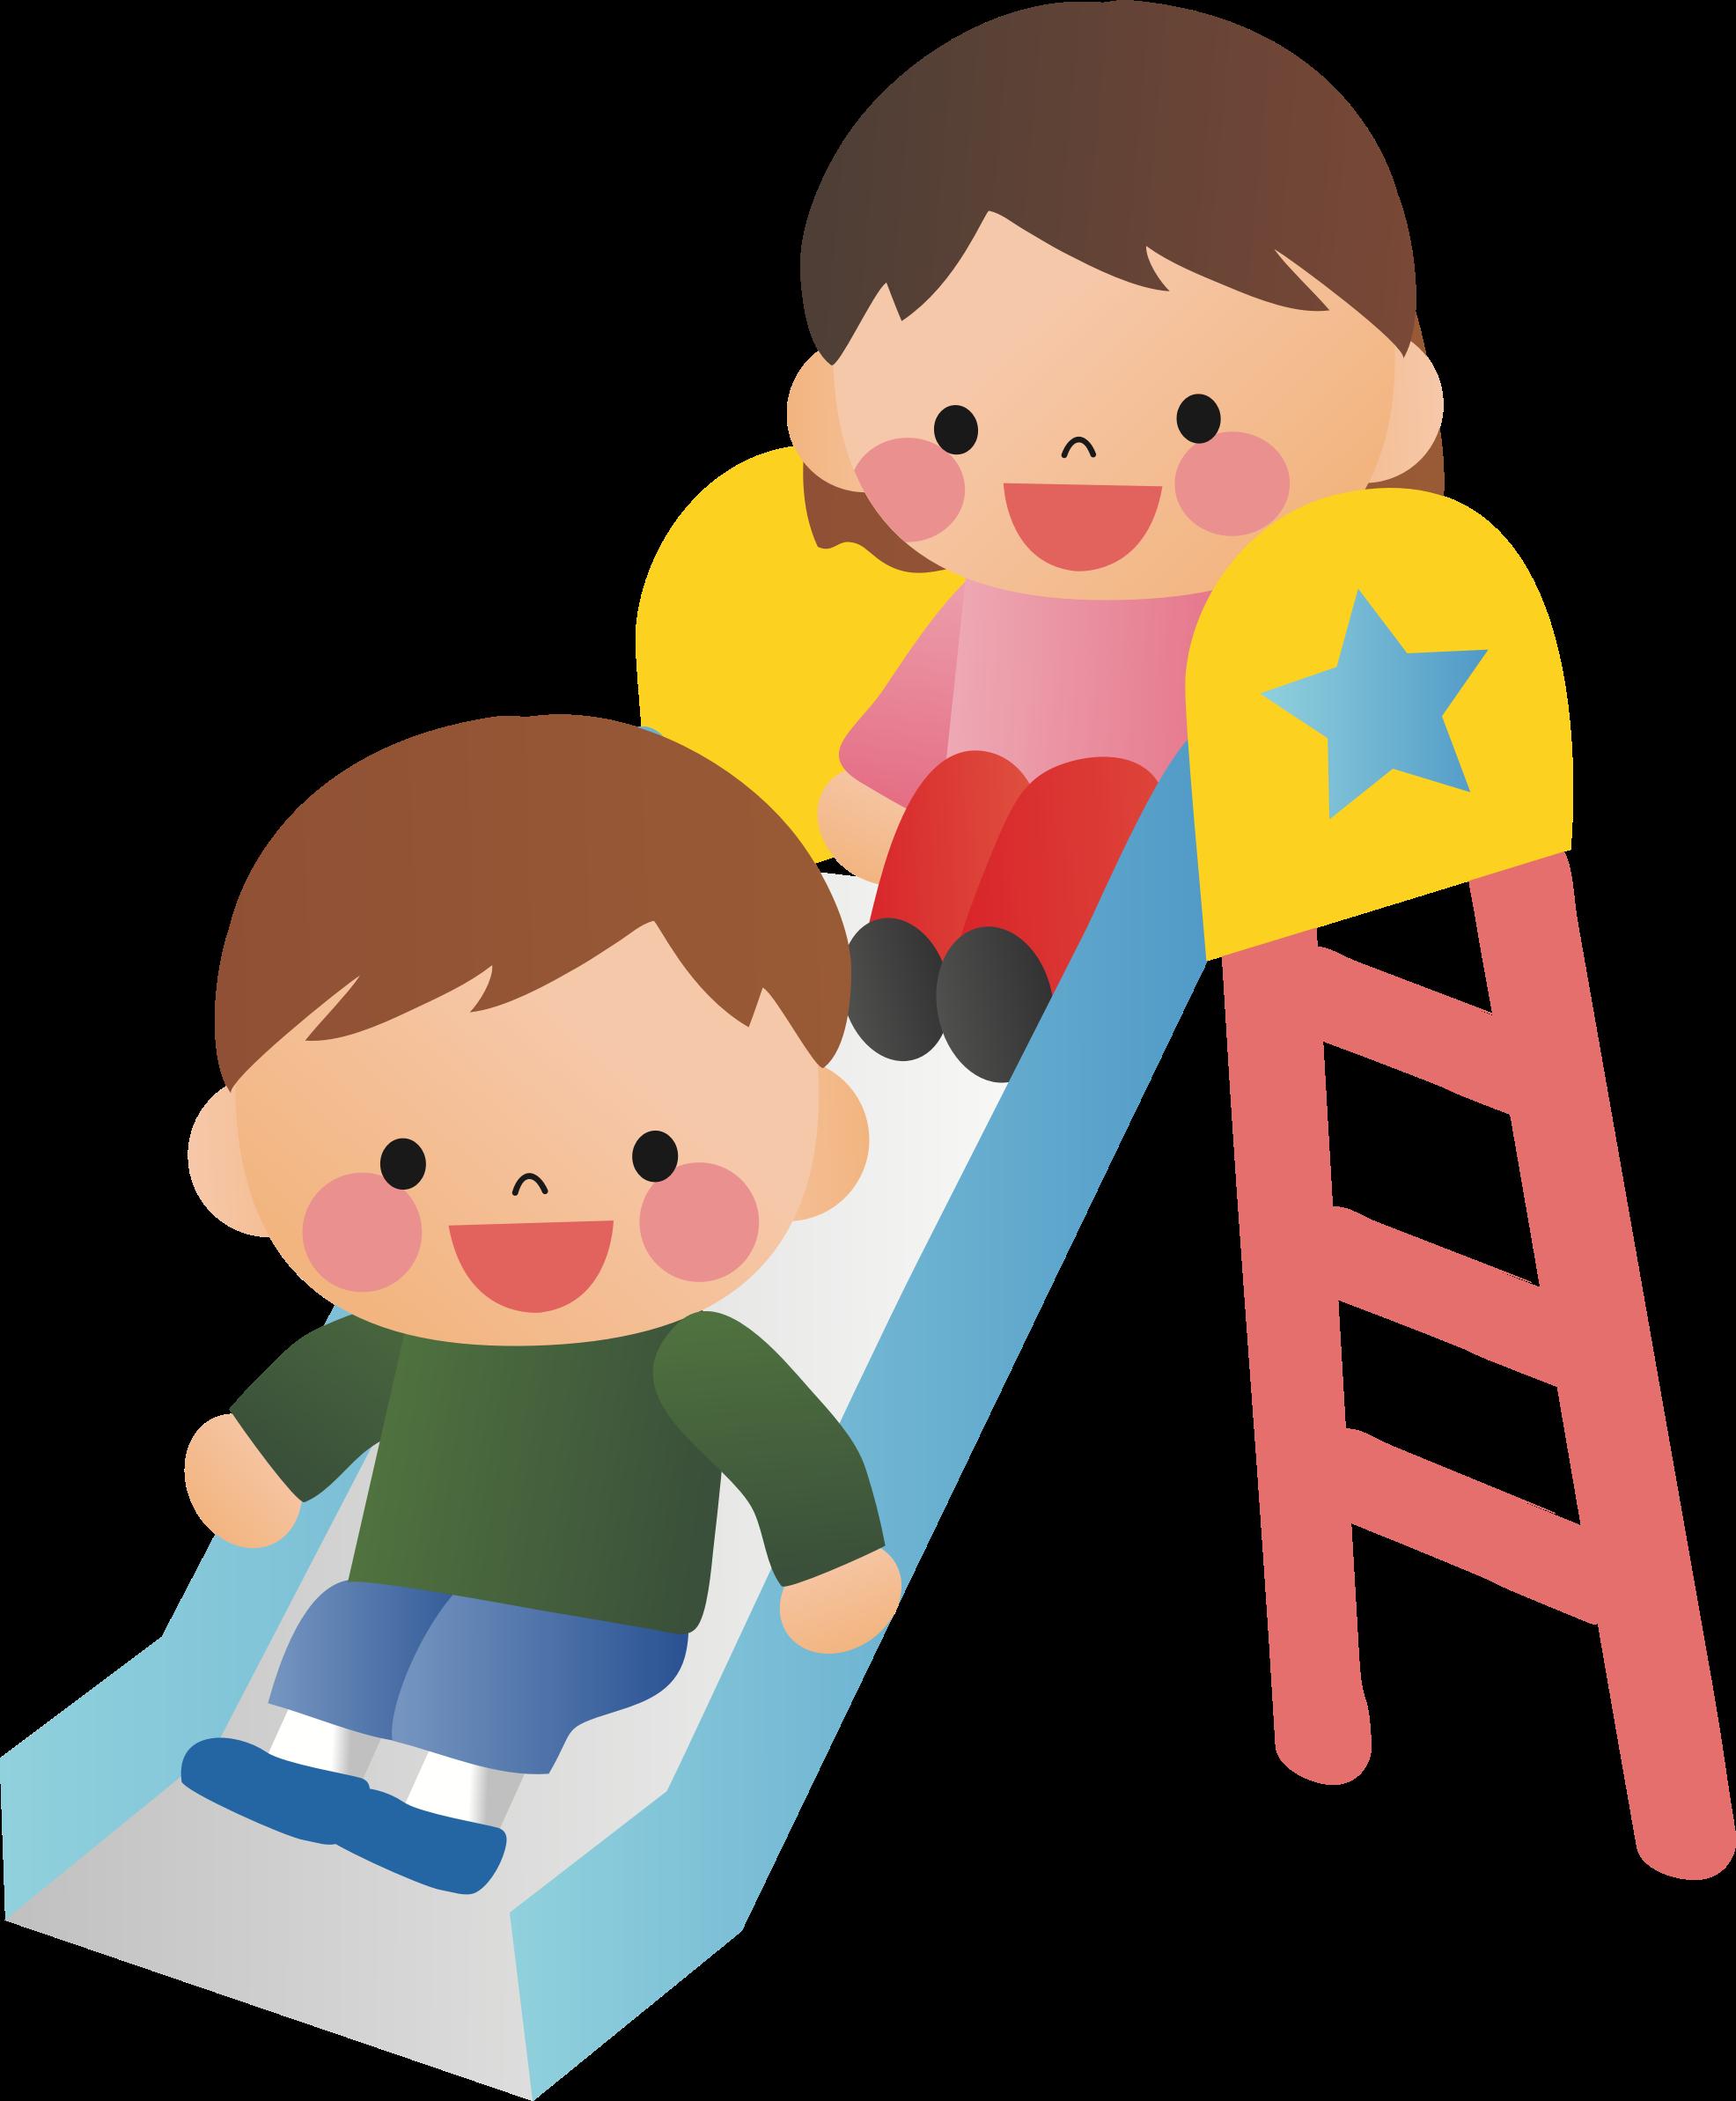 Clipart kids playground. Slide big image png